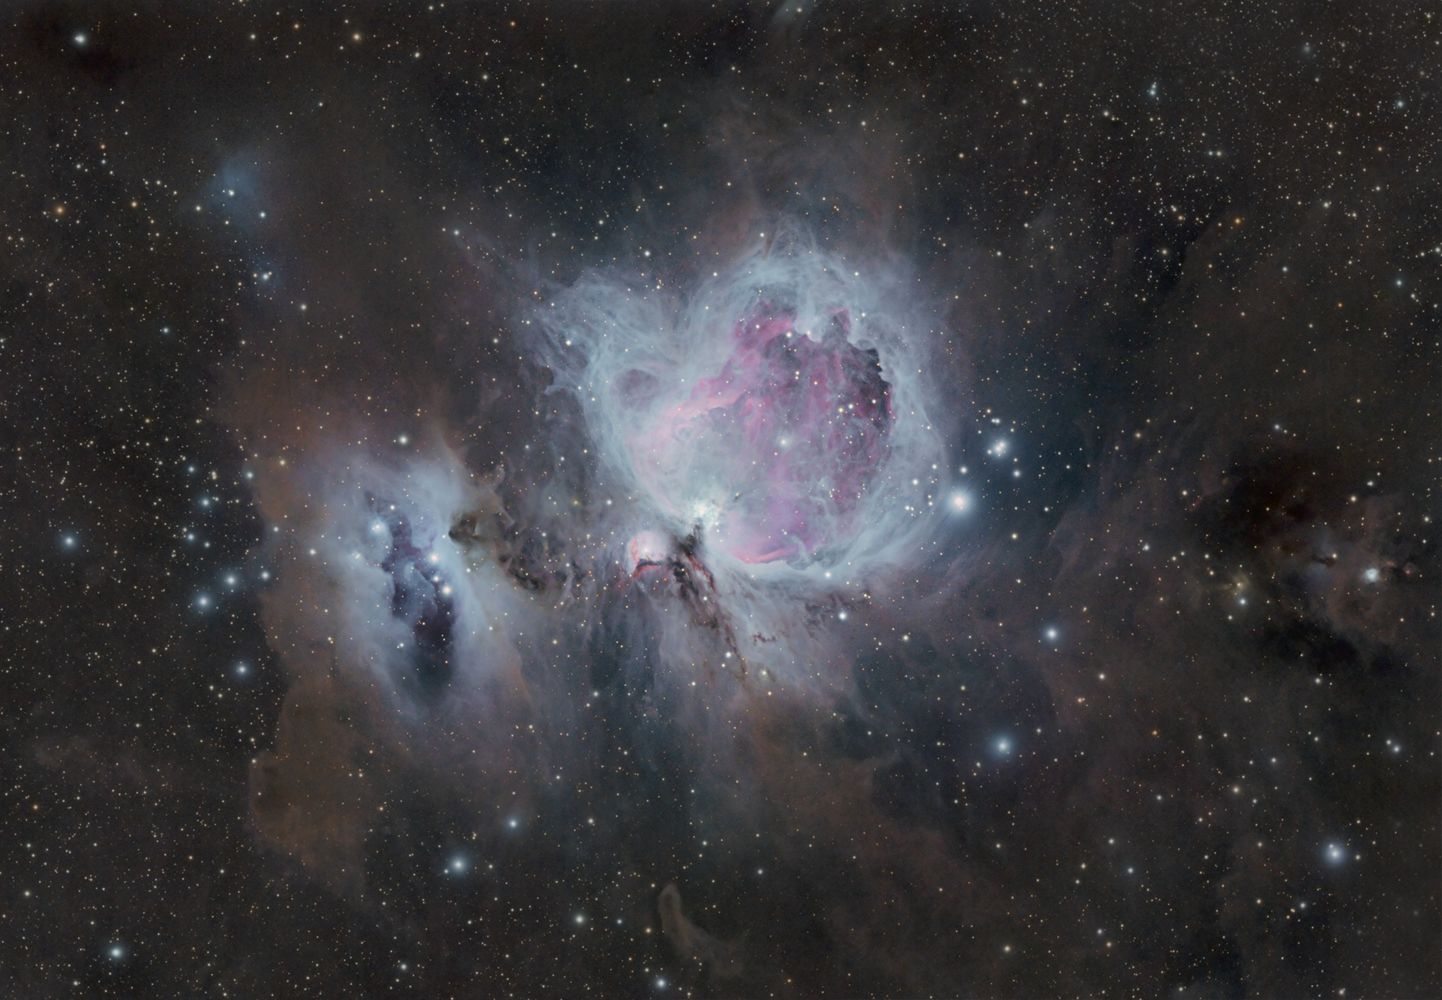 molecular clouds around the great nebula in Orion by Robert Huerbsch